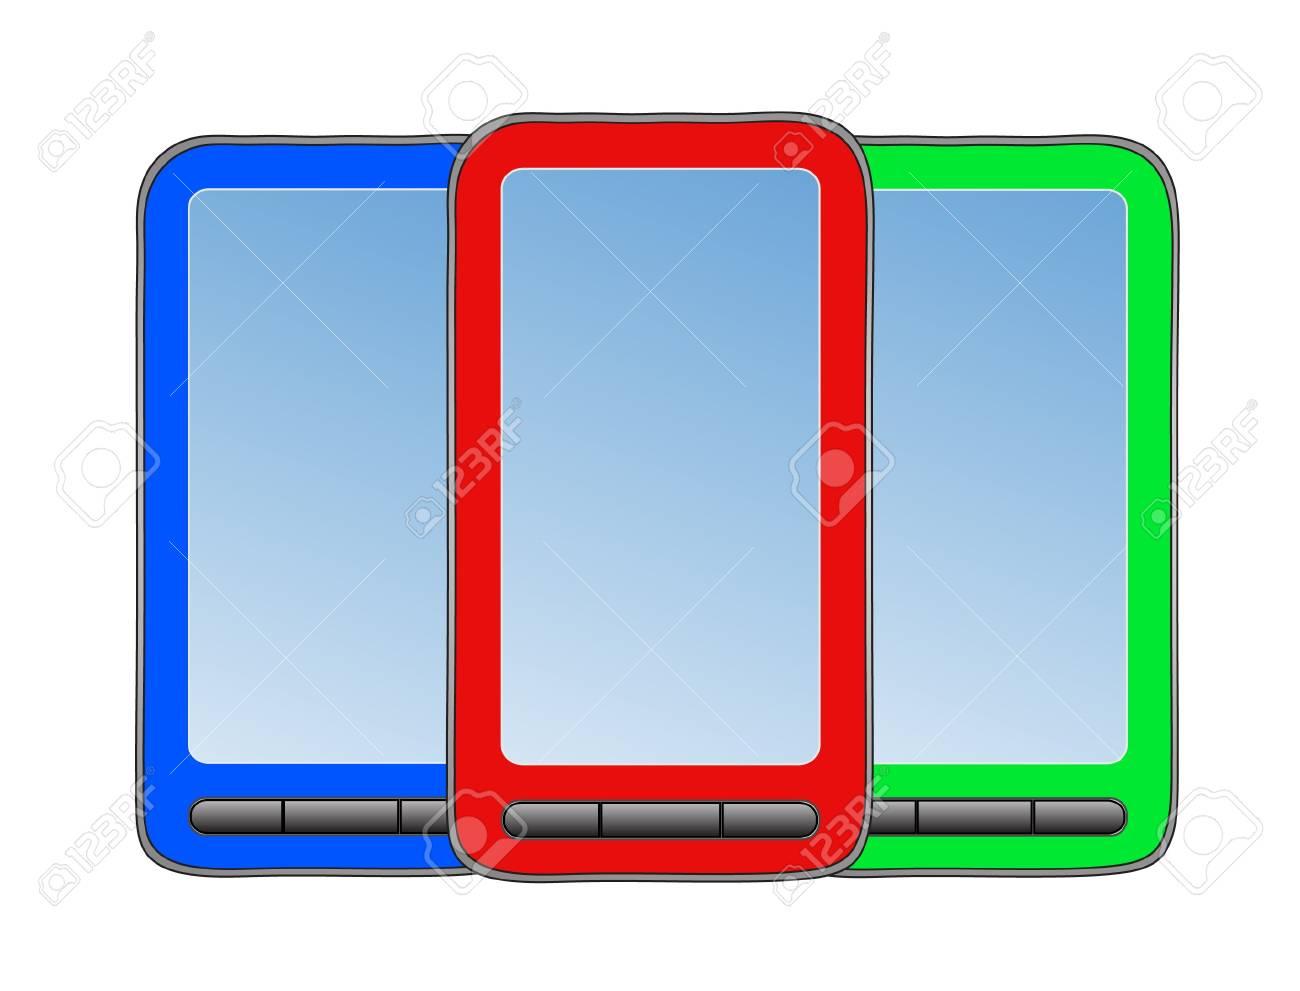 Three phone on white background. Stock Vector - 10030223